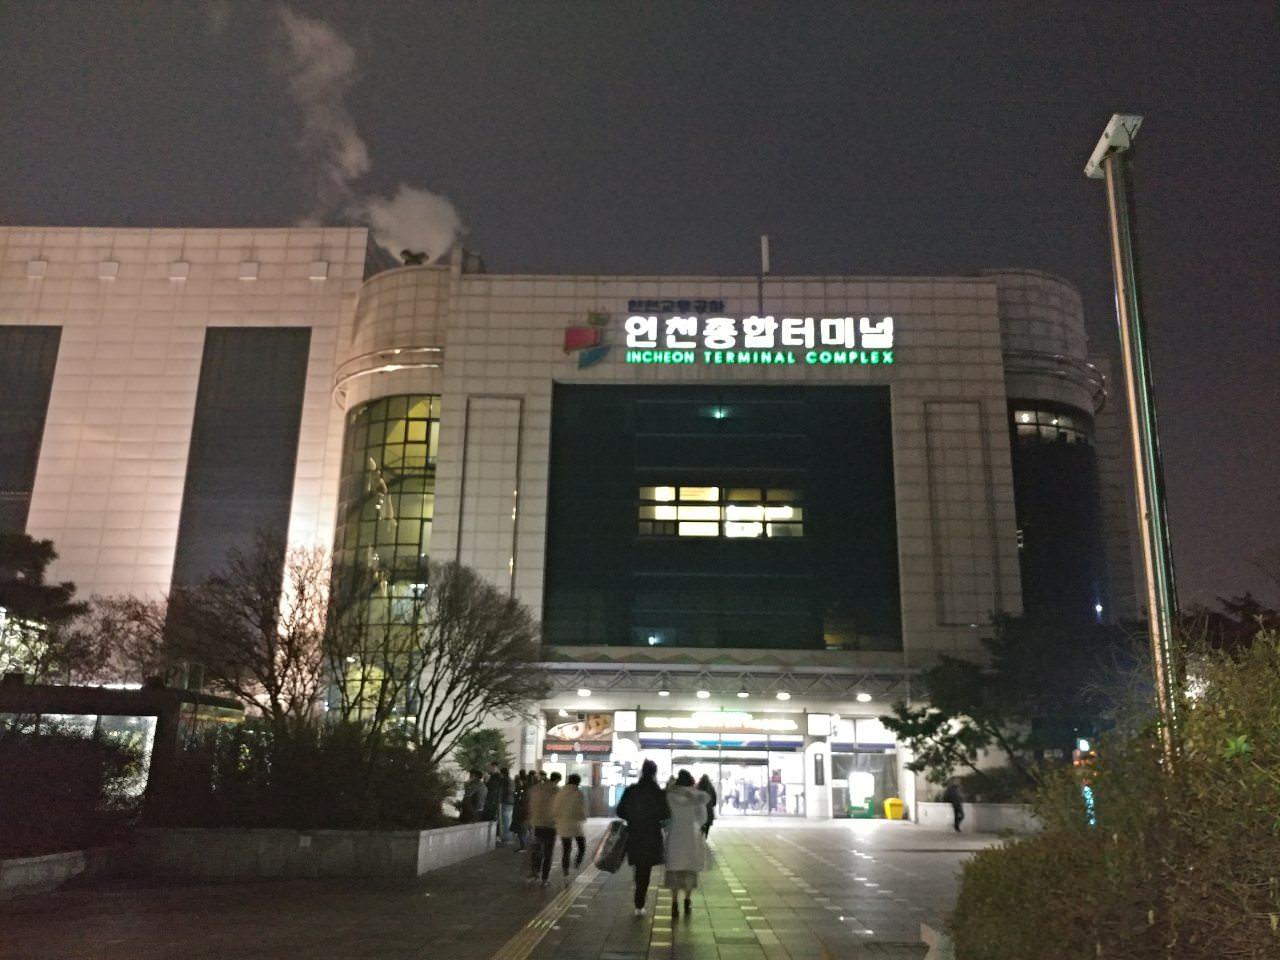 incheon-bus-terminal-complex